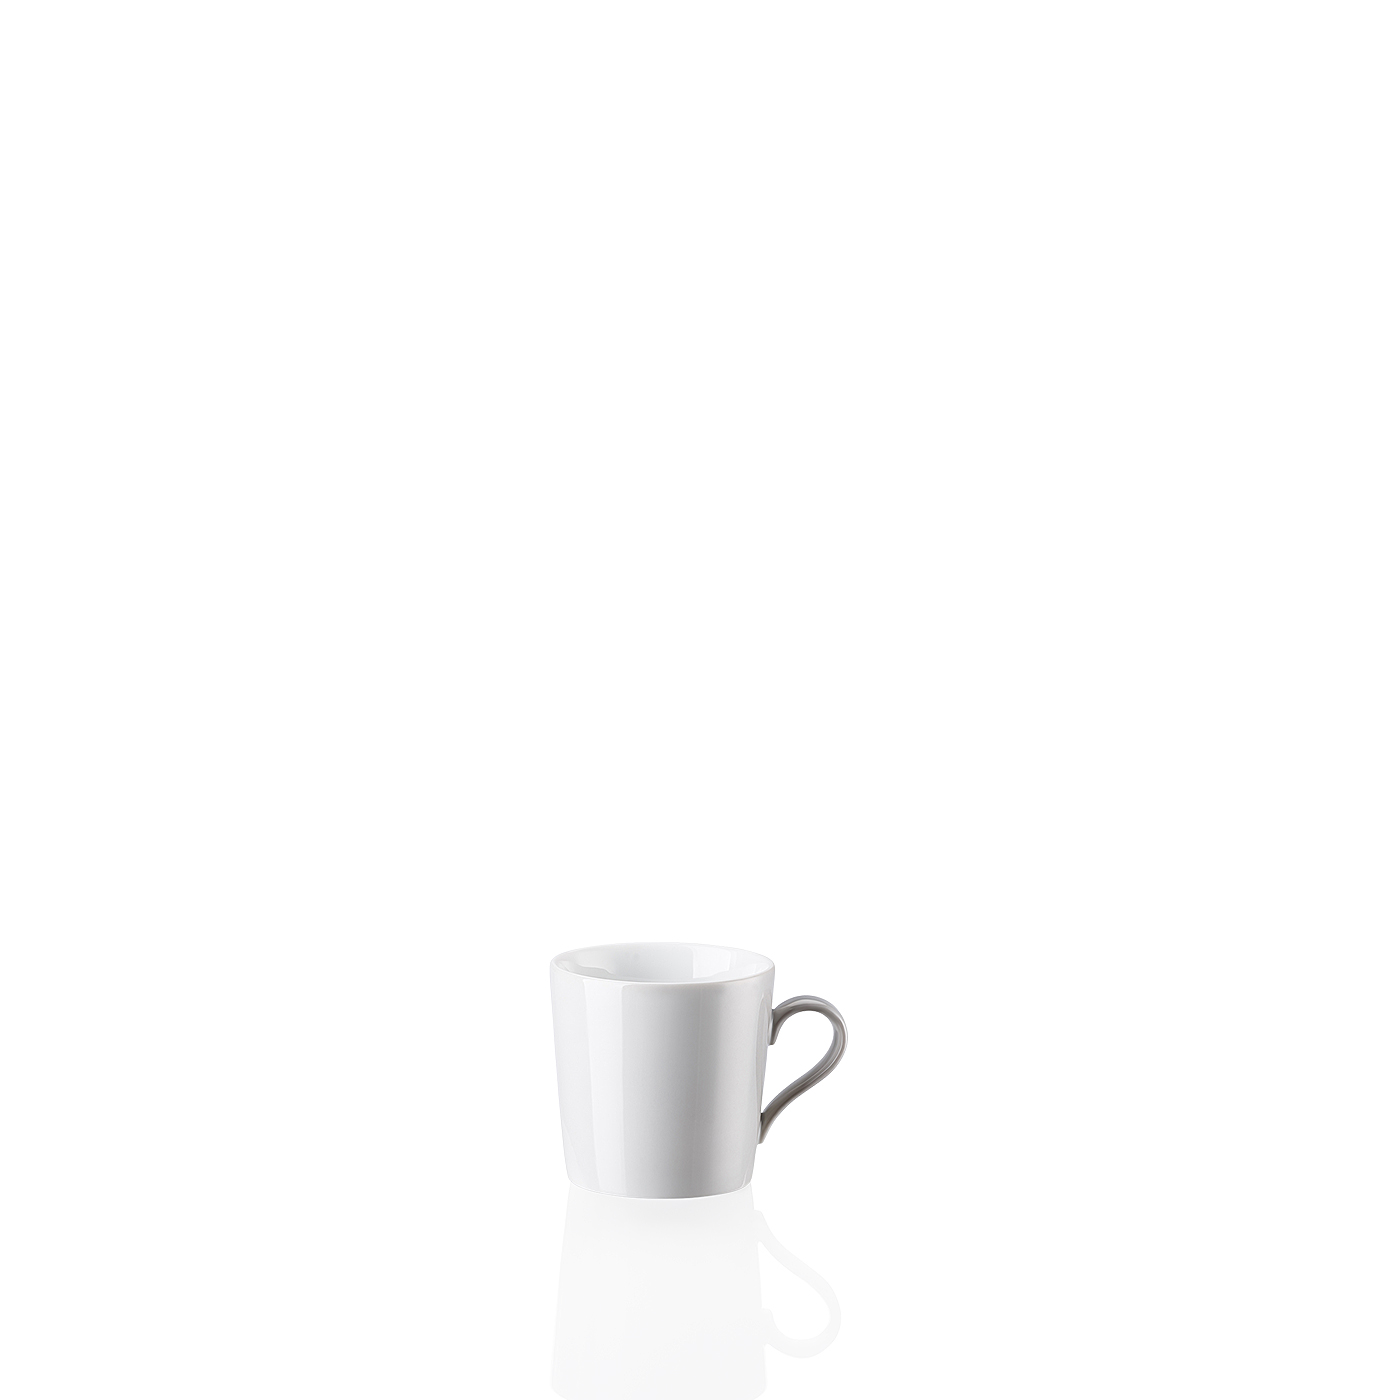 Espresso-/Mokka-Obertasse Tric Cool Arzberg